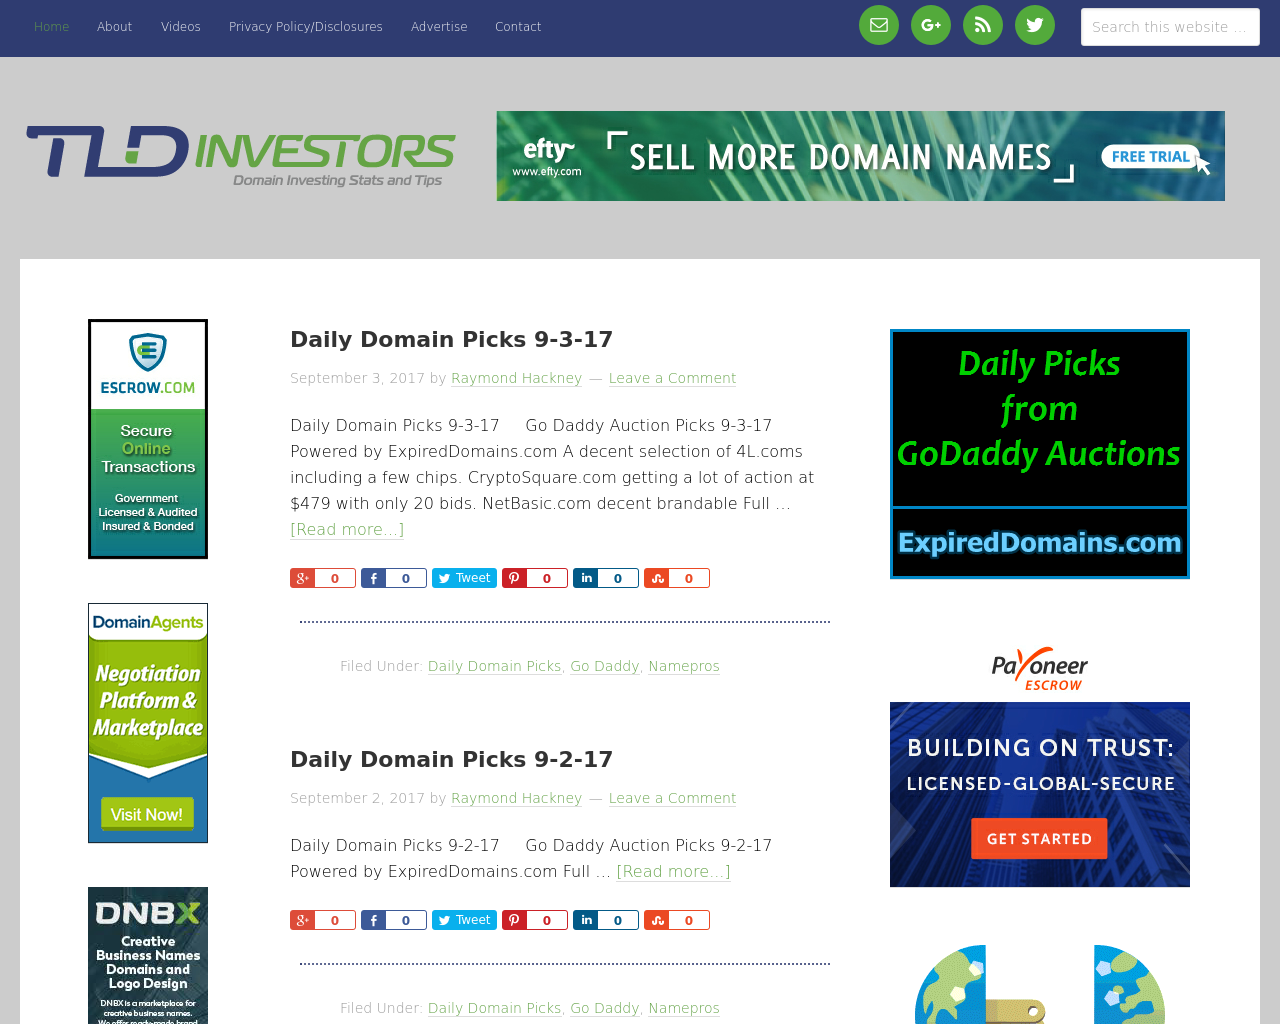 TLD-Investors-Advertising-Reviews-Pricing